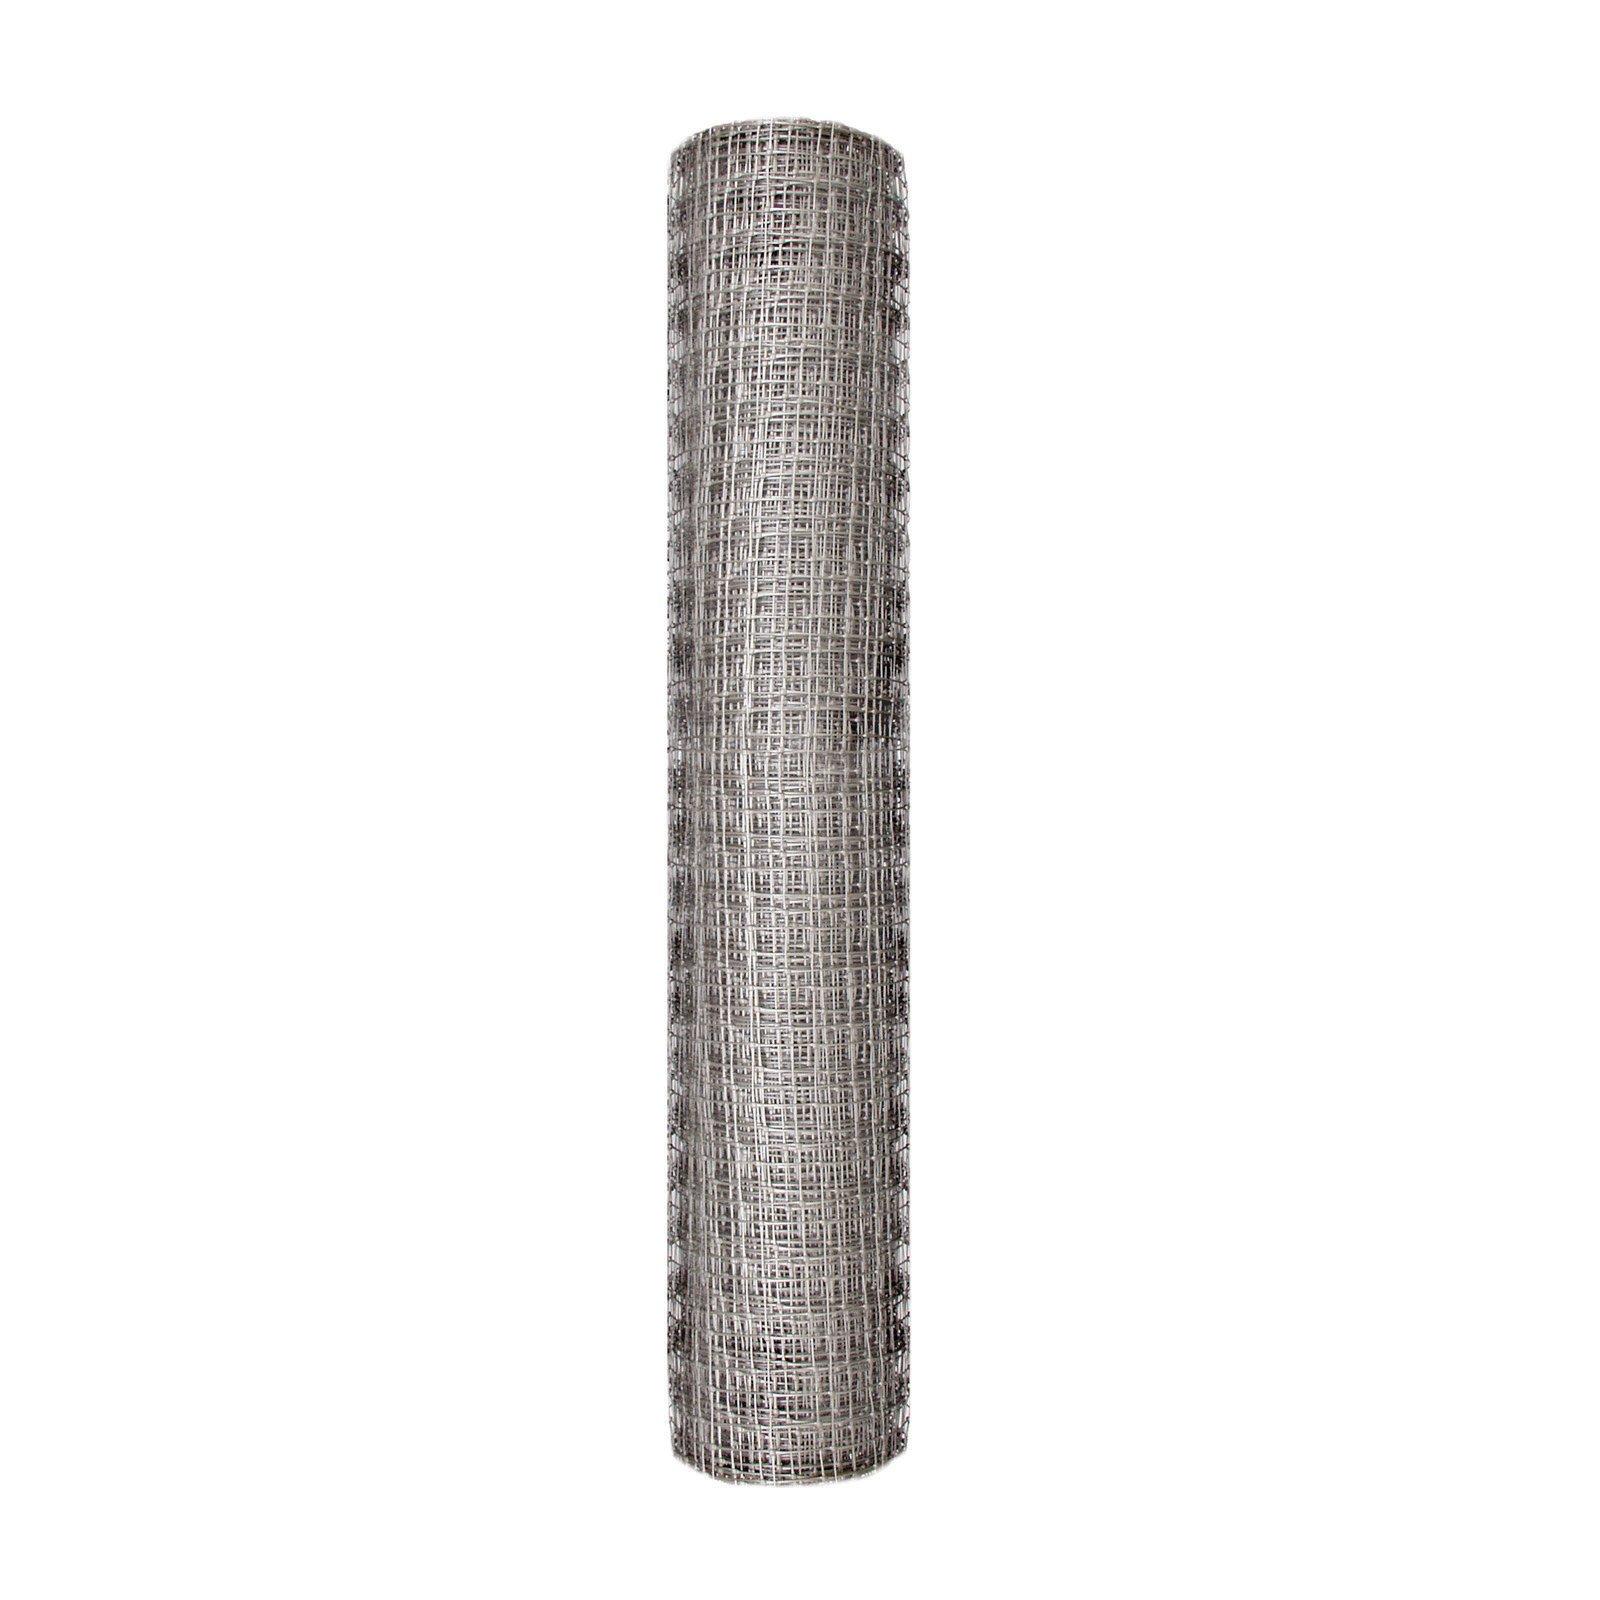 Origin Point 312450 50-Foot x 24-Inch Gray Plastic